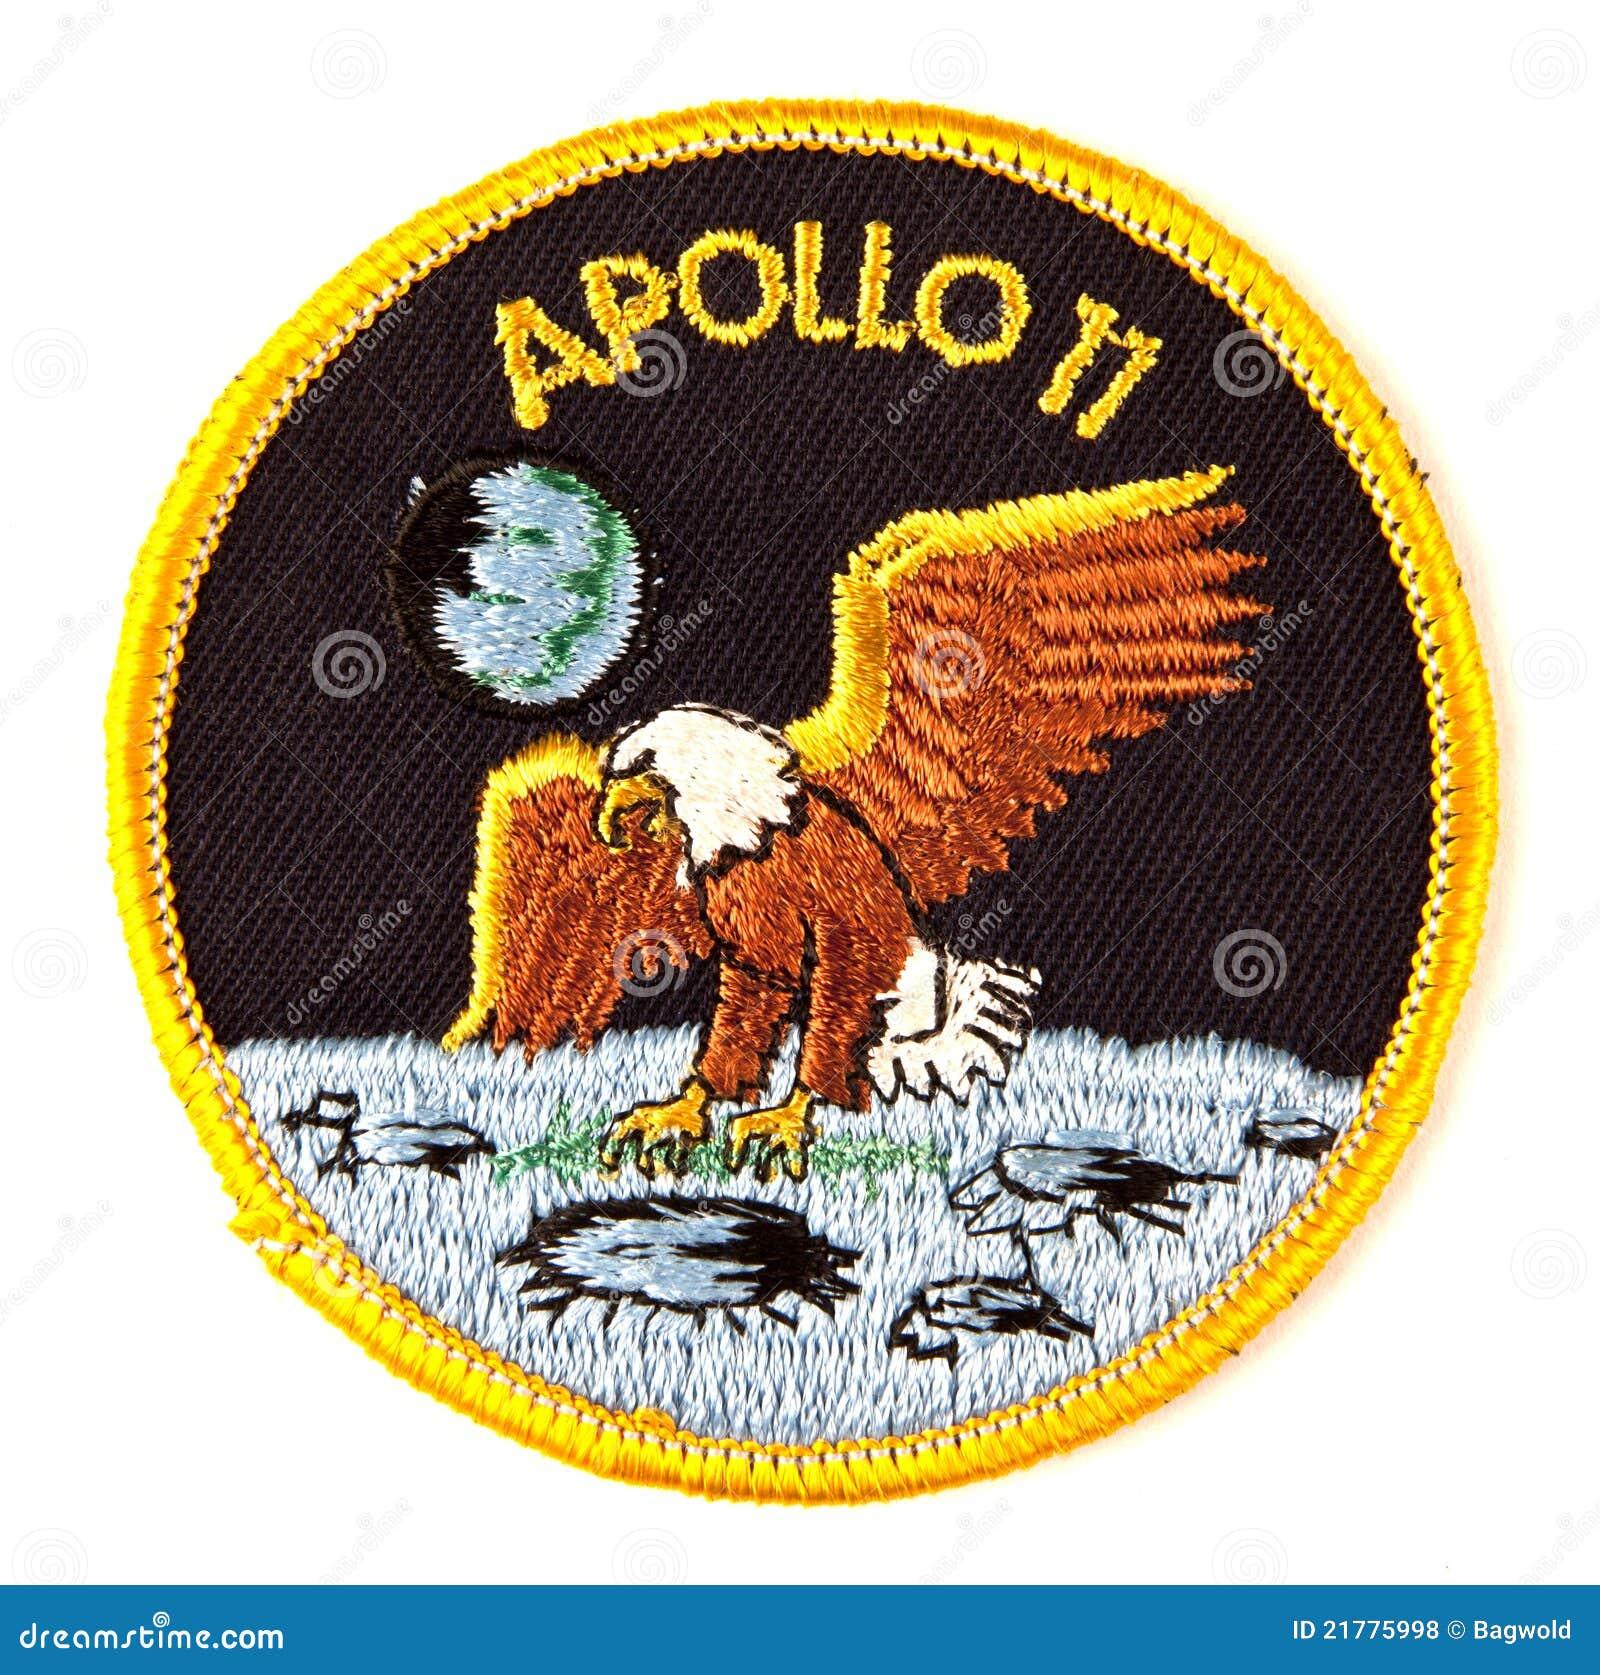 apollo space badges - photo #24